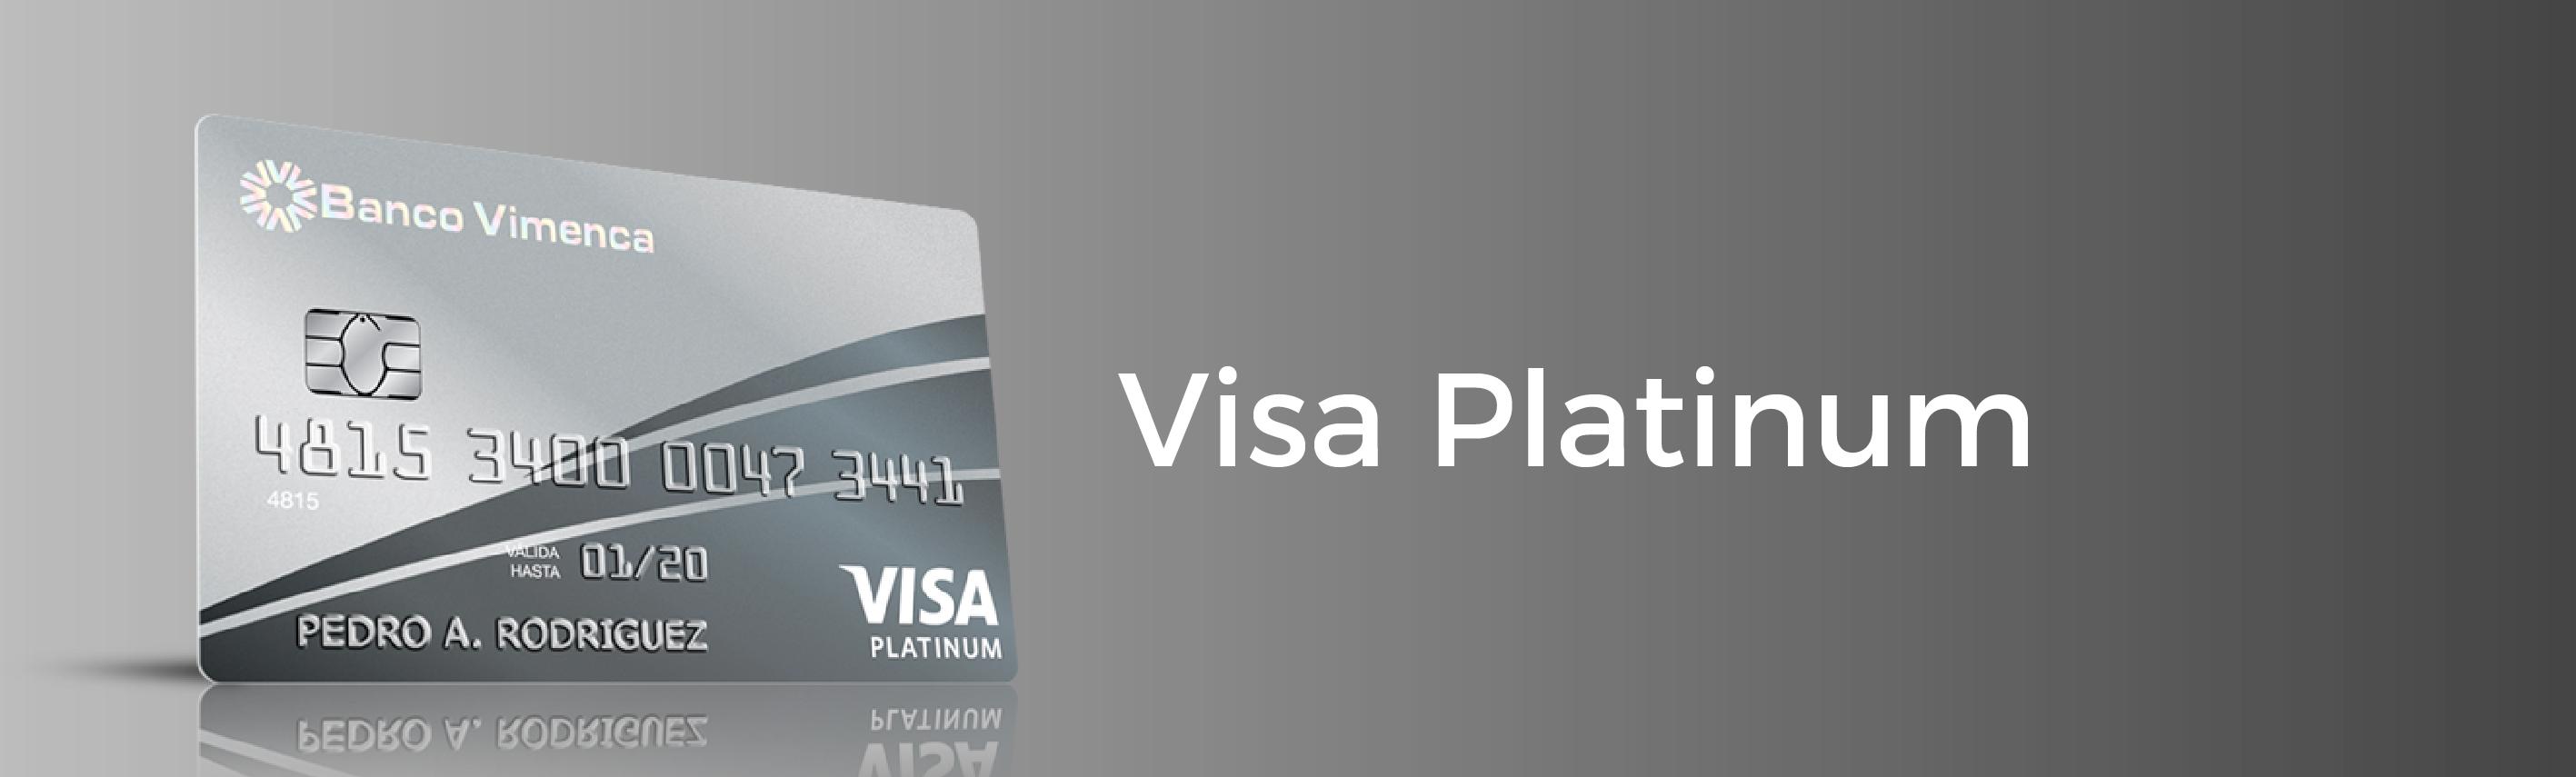 Tarjeta de Crédito Visa Platinum Internacional